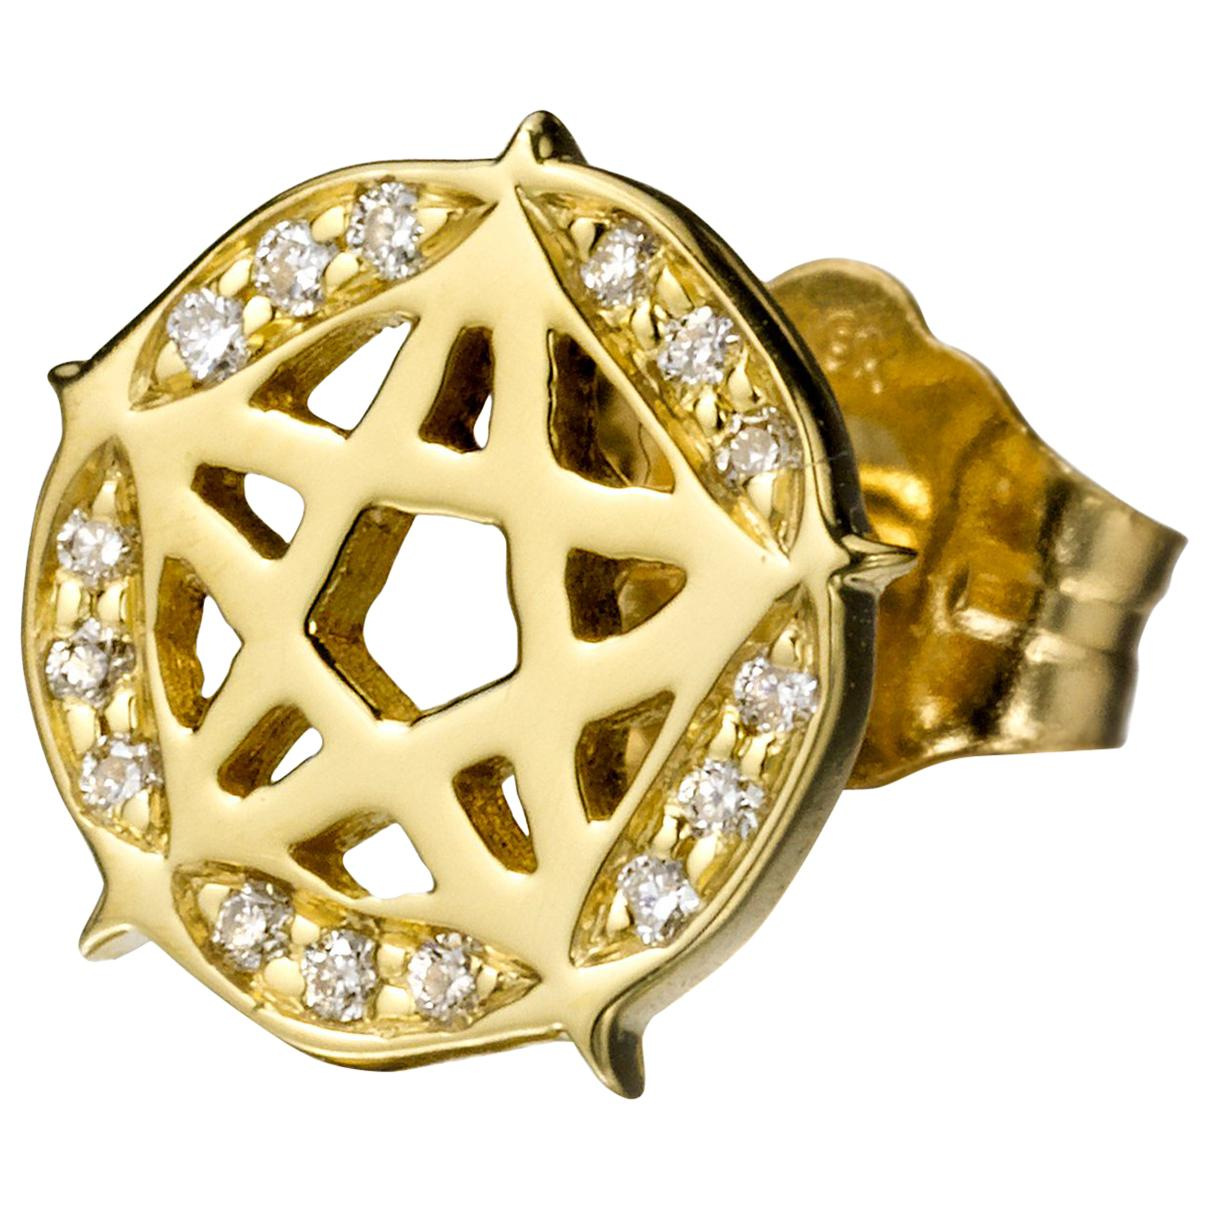 Wendy Brandes Punk Pentagram Star 18K Gold Pave Diamond Stud Earring, Single